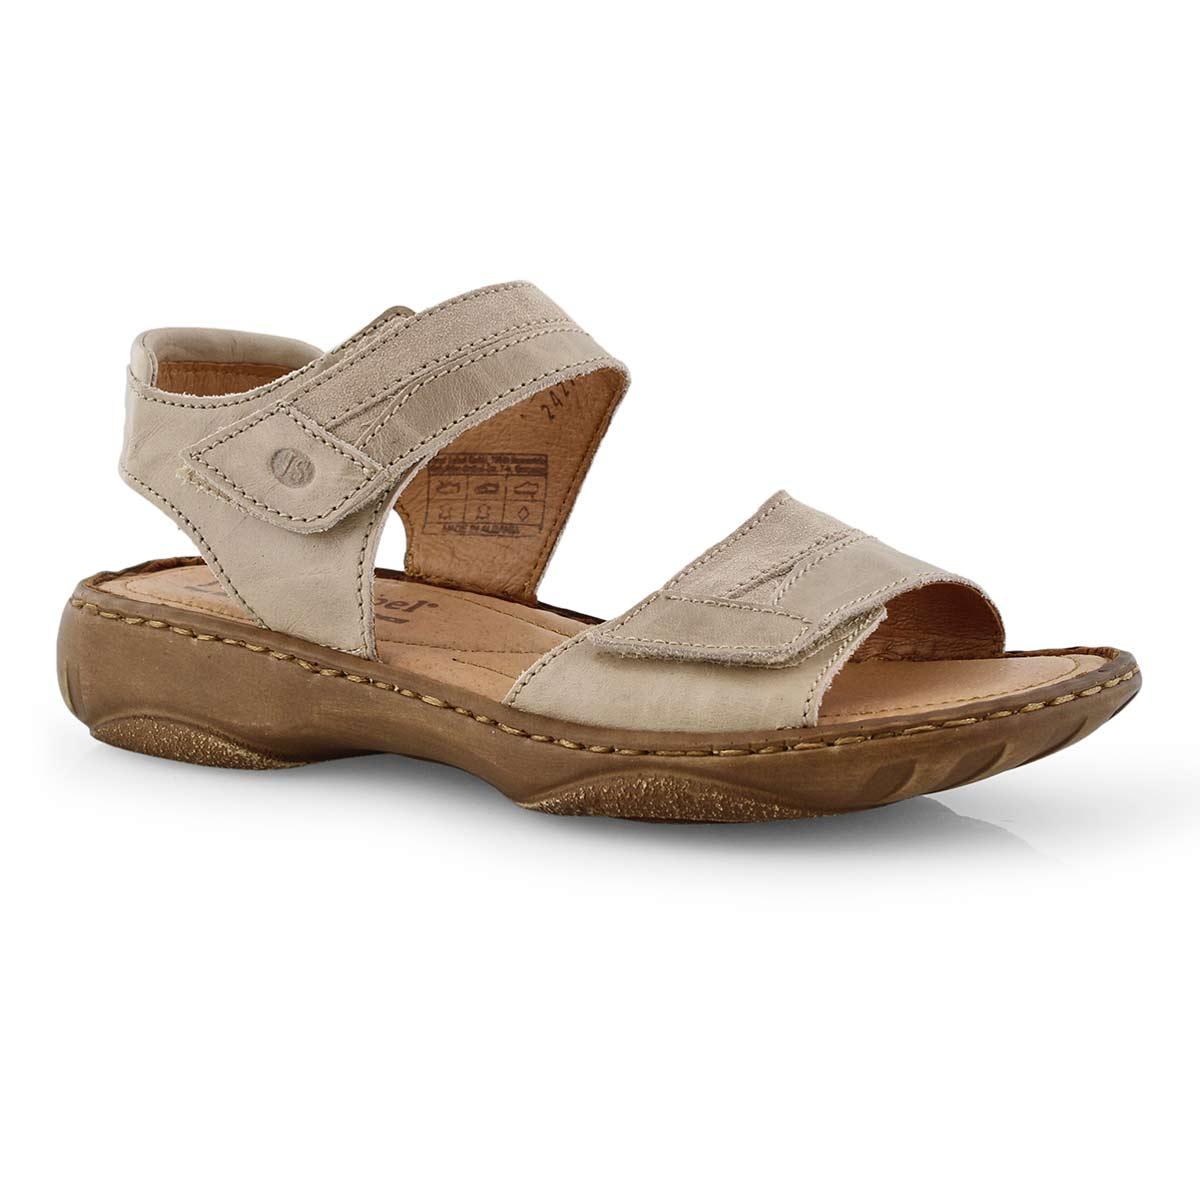 Lds Debra 19 sand casual 2 strap sandal